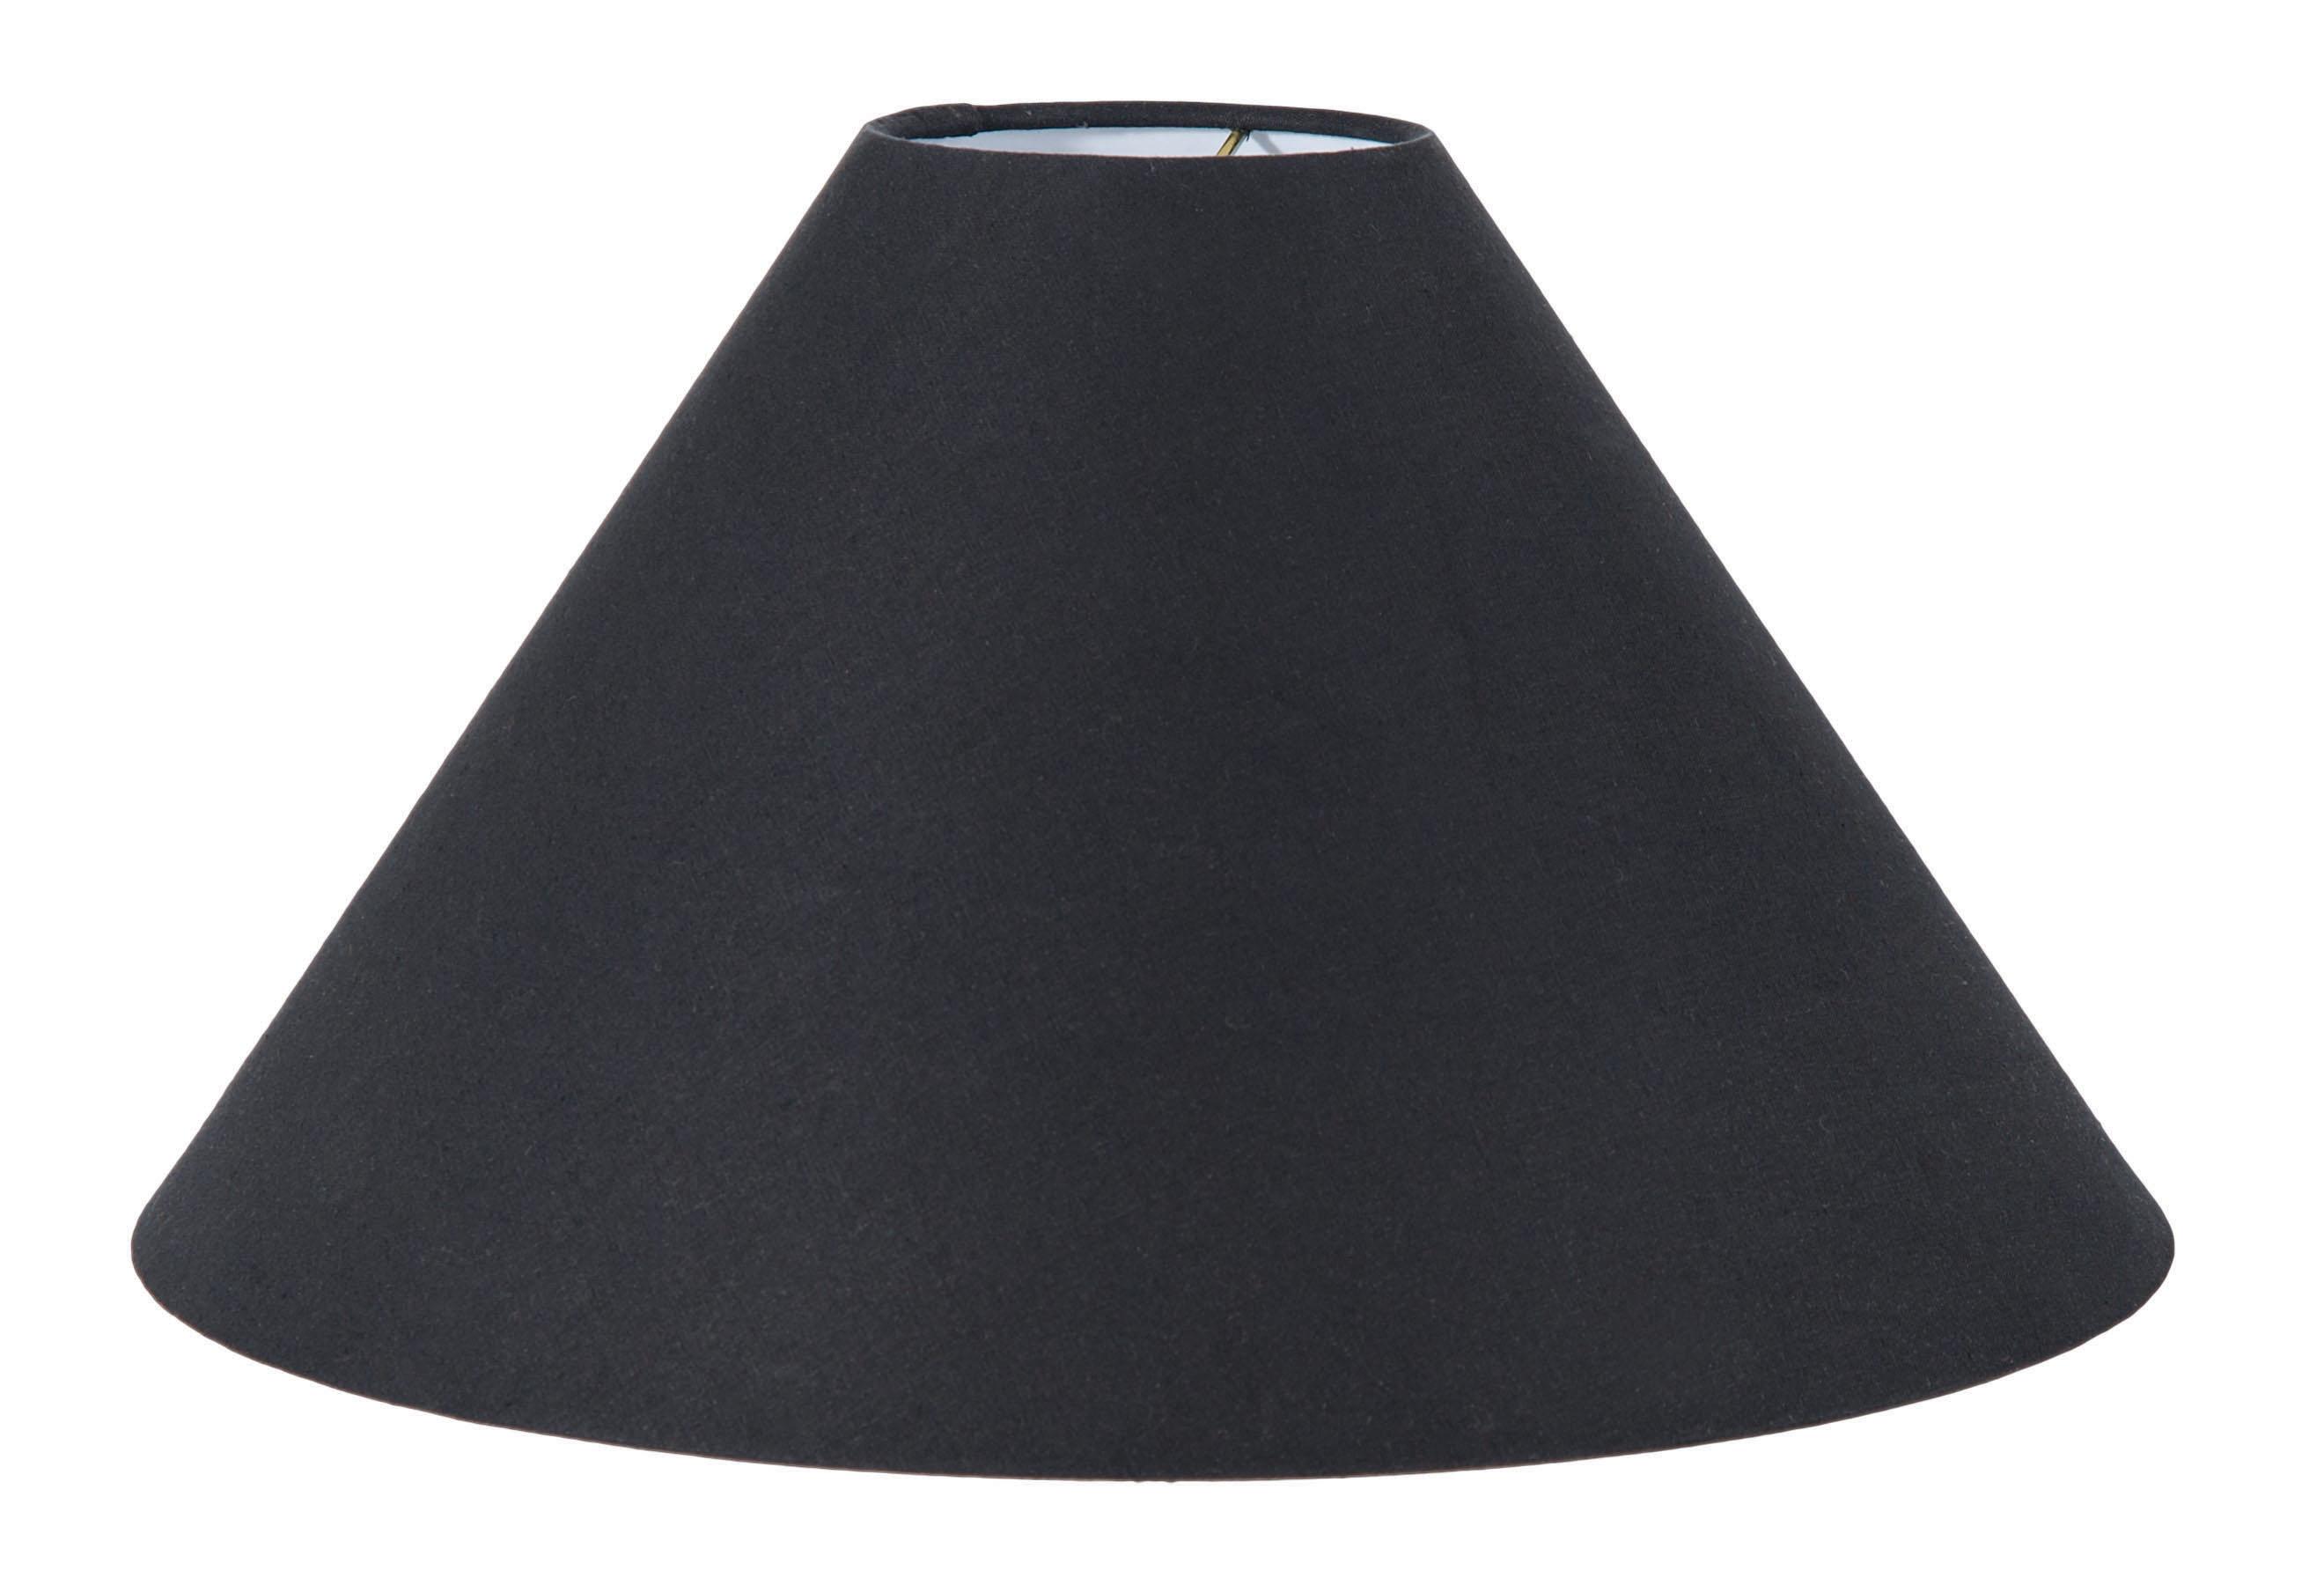 Black Linen Cone Lampshade 05652n B Amp P Lamp Supply